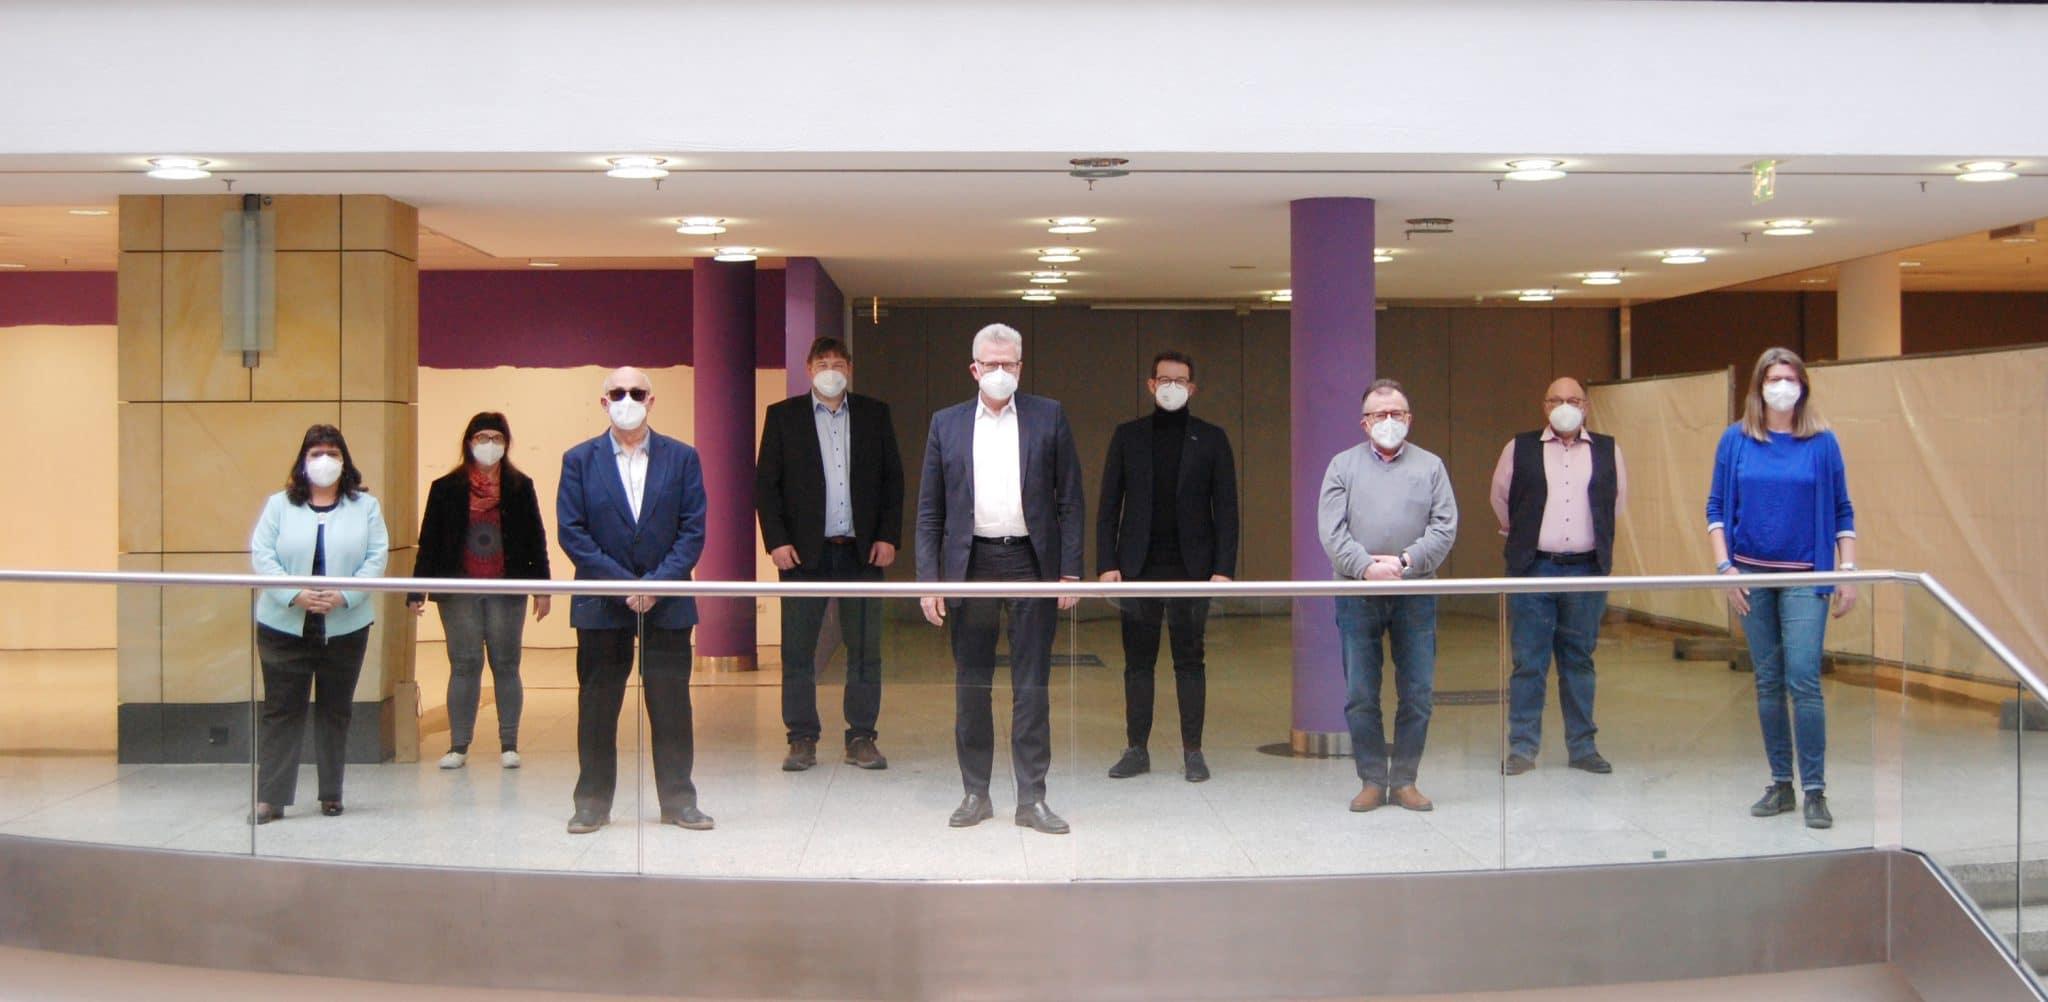 Behindertenbeirat - Bayreuth.de